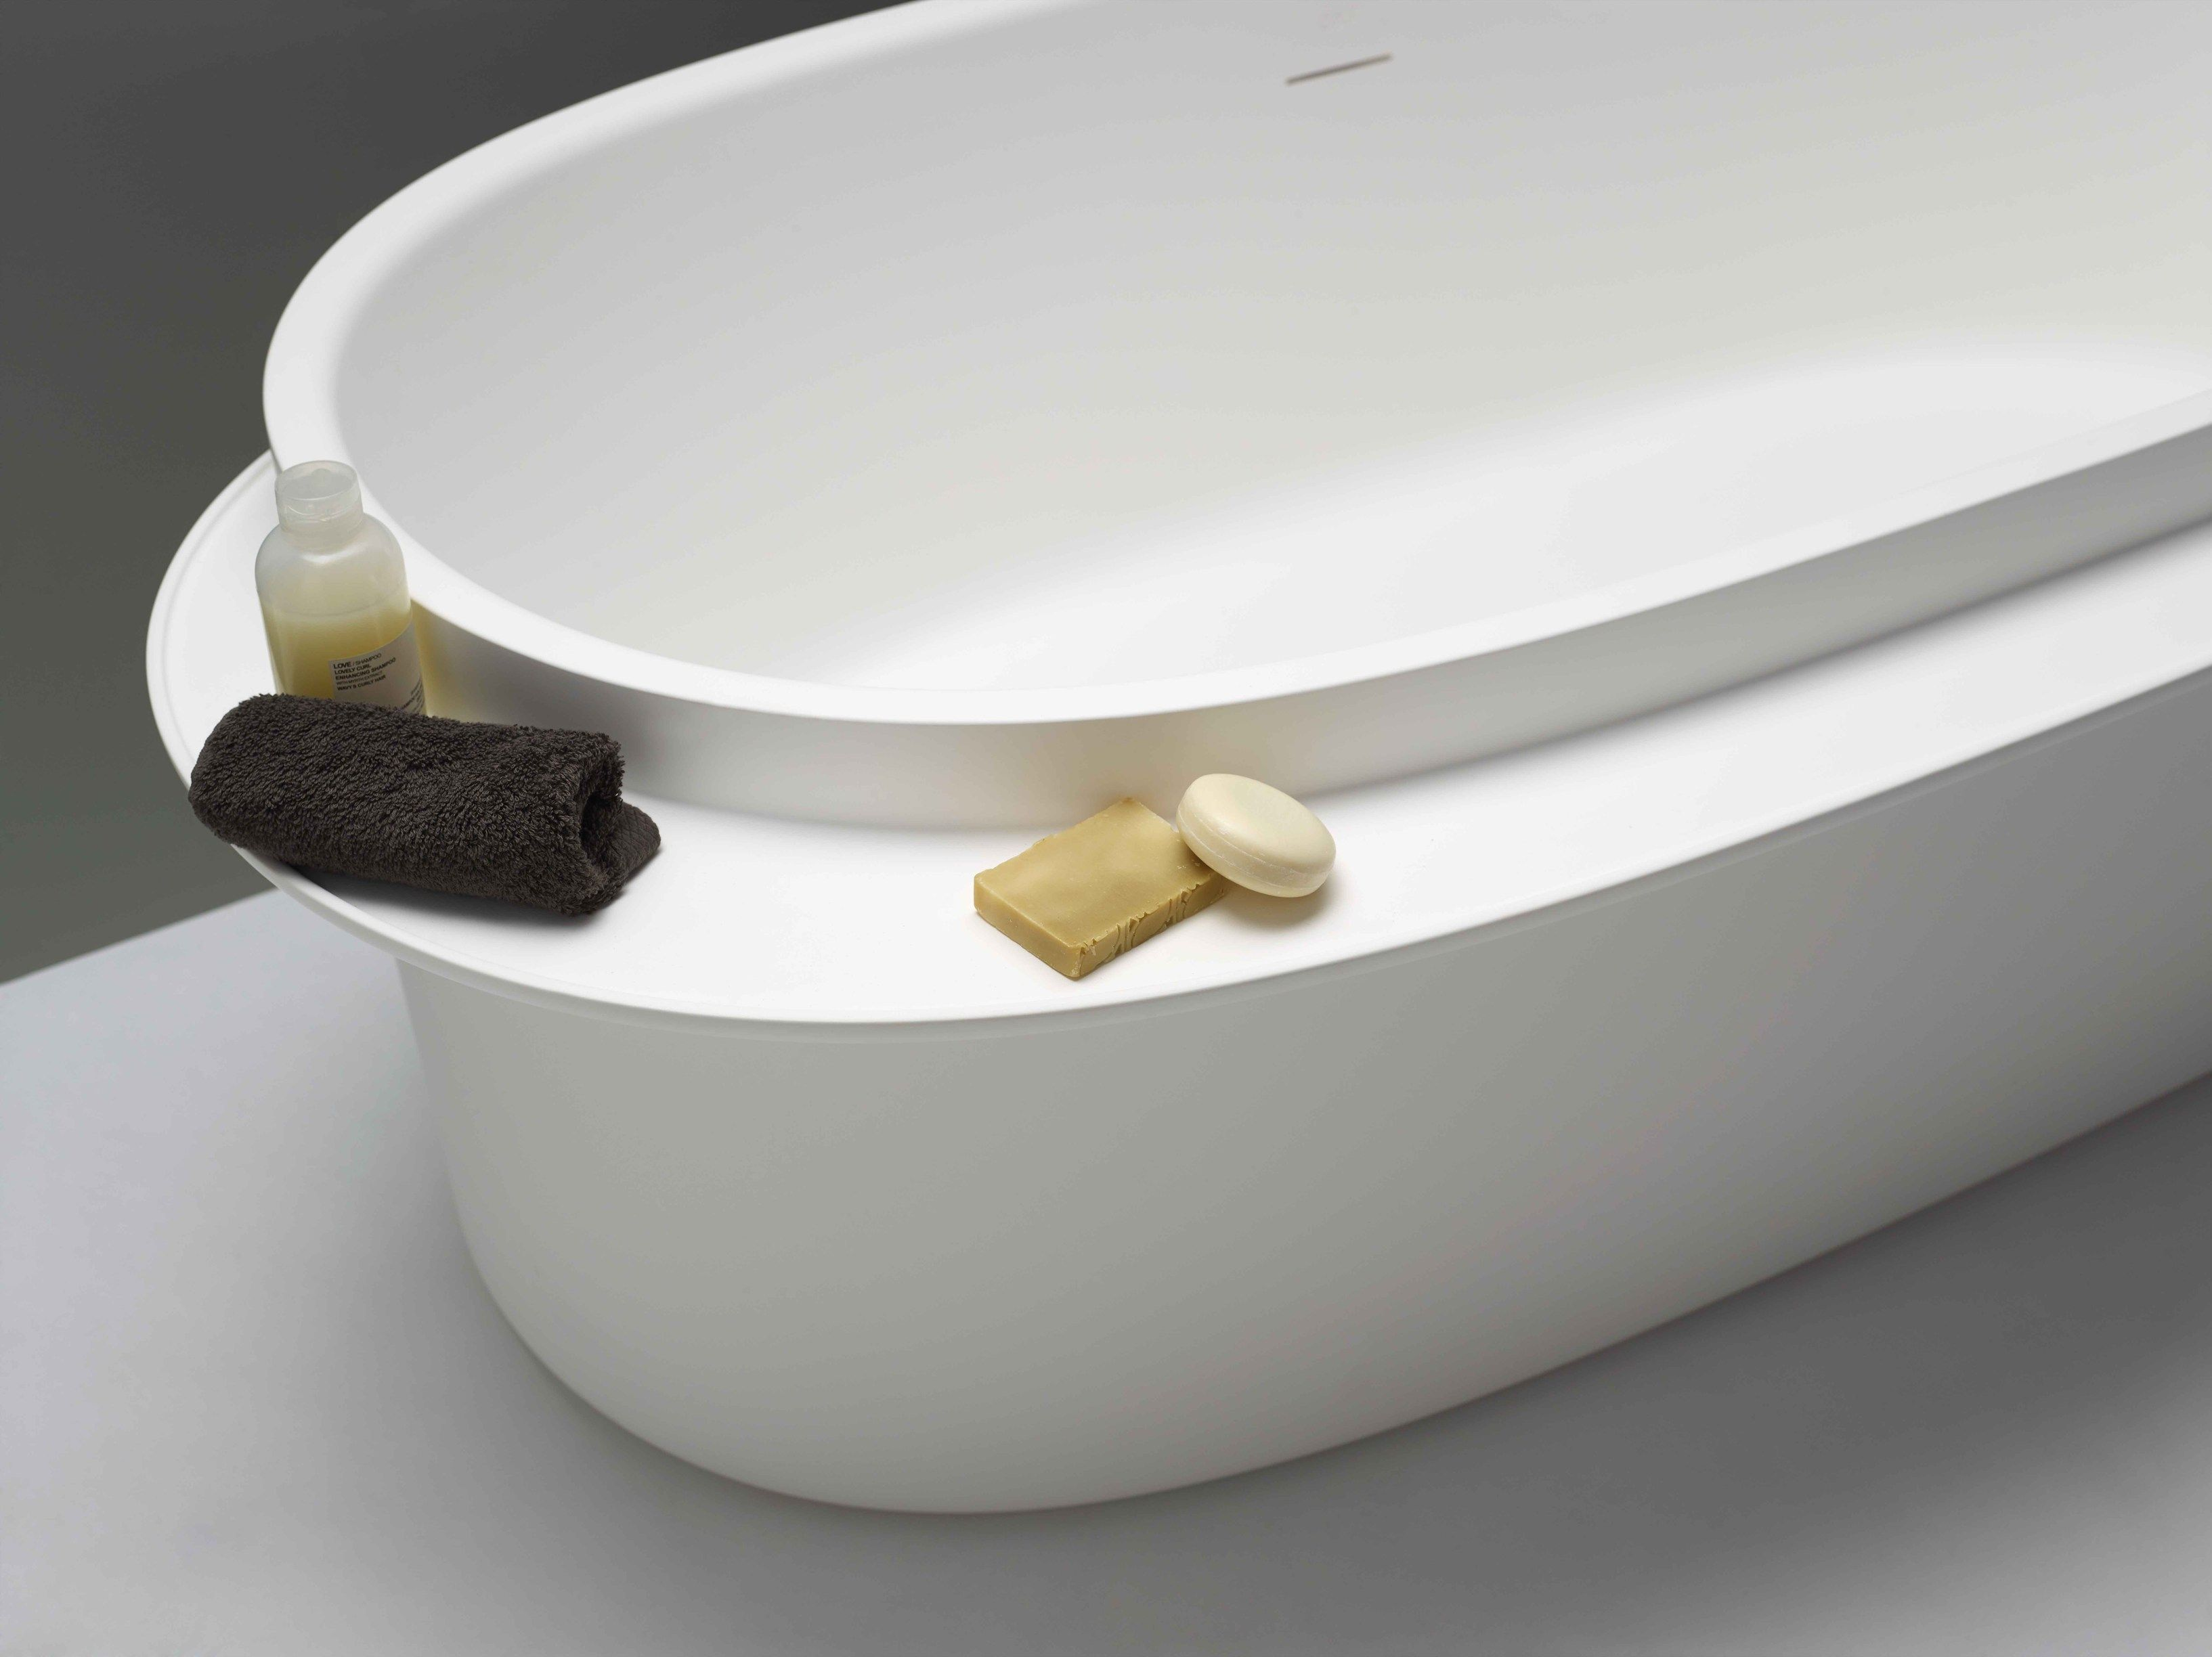 Vasca Da Bagno Ovale : Vasca oval solid surface vasche da bagno iperceramica of